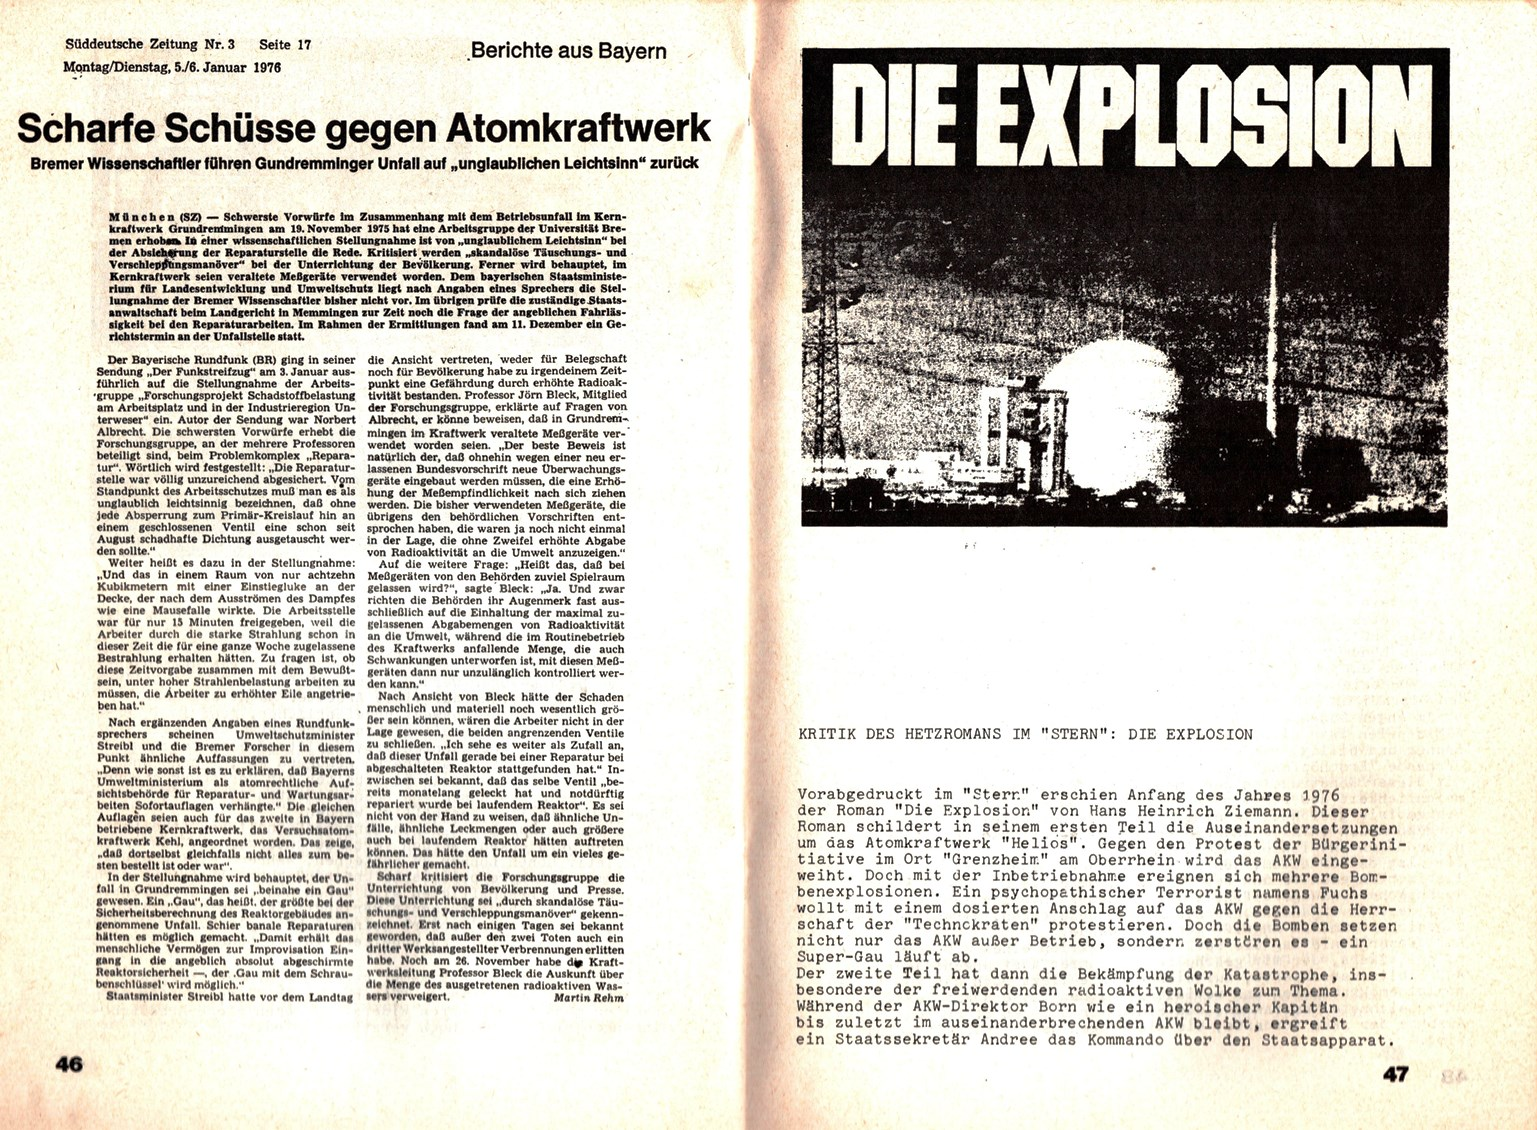 KSV_1976_Atomenergie_im_Kapitalismus_025